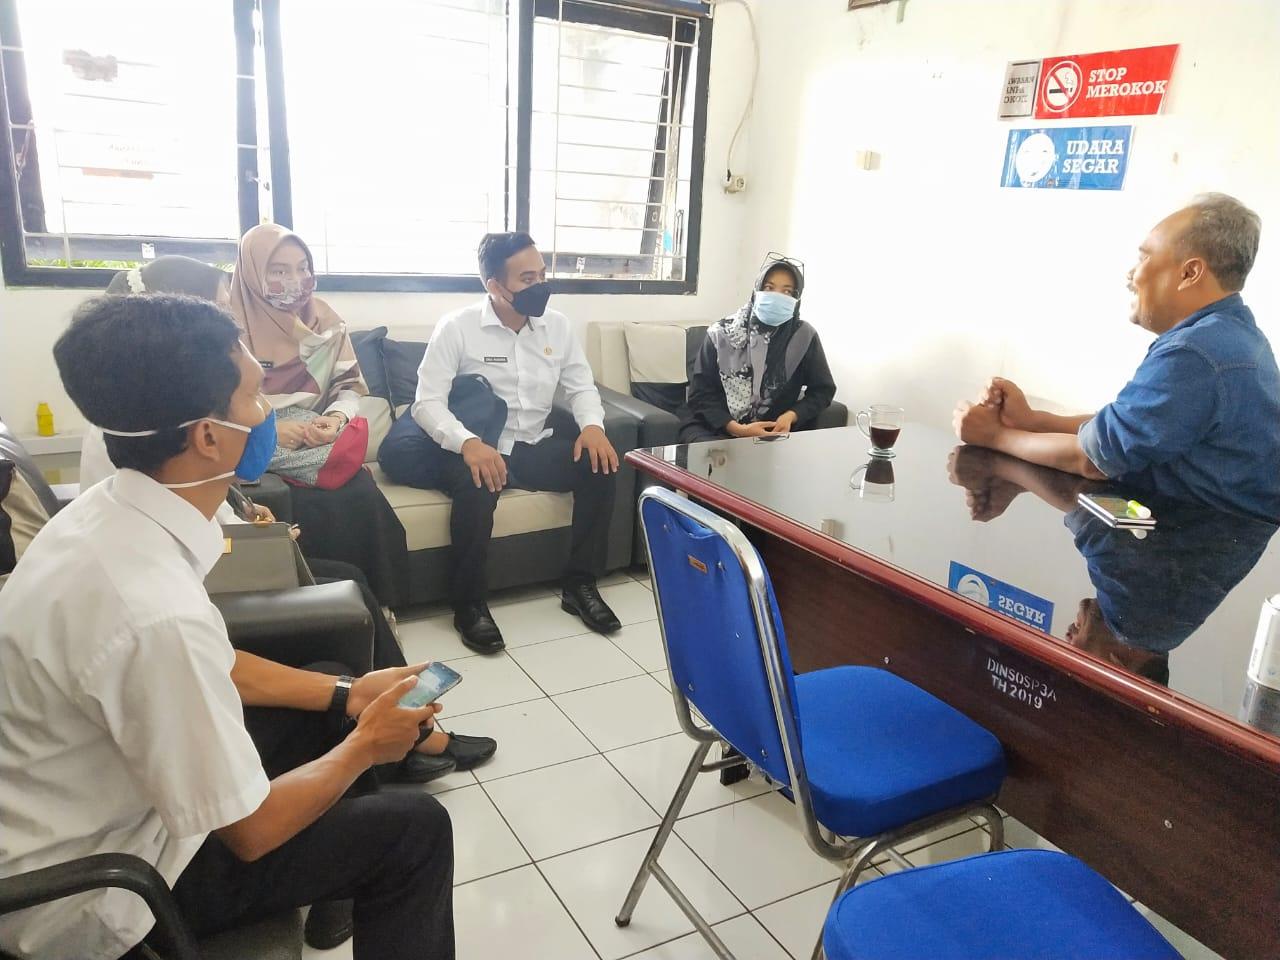 Rabu, 03 Februari 2021 Kunjungan Kerja Dinas Sosial Provinsi Jawa Barat di Kantor DinsosP3A